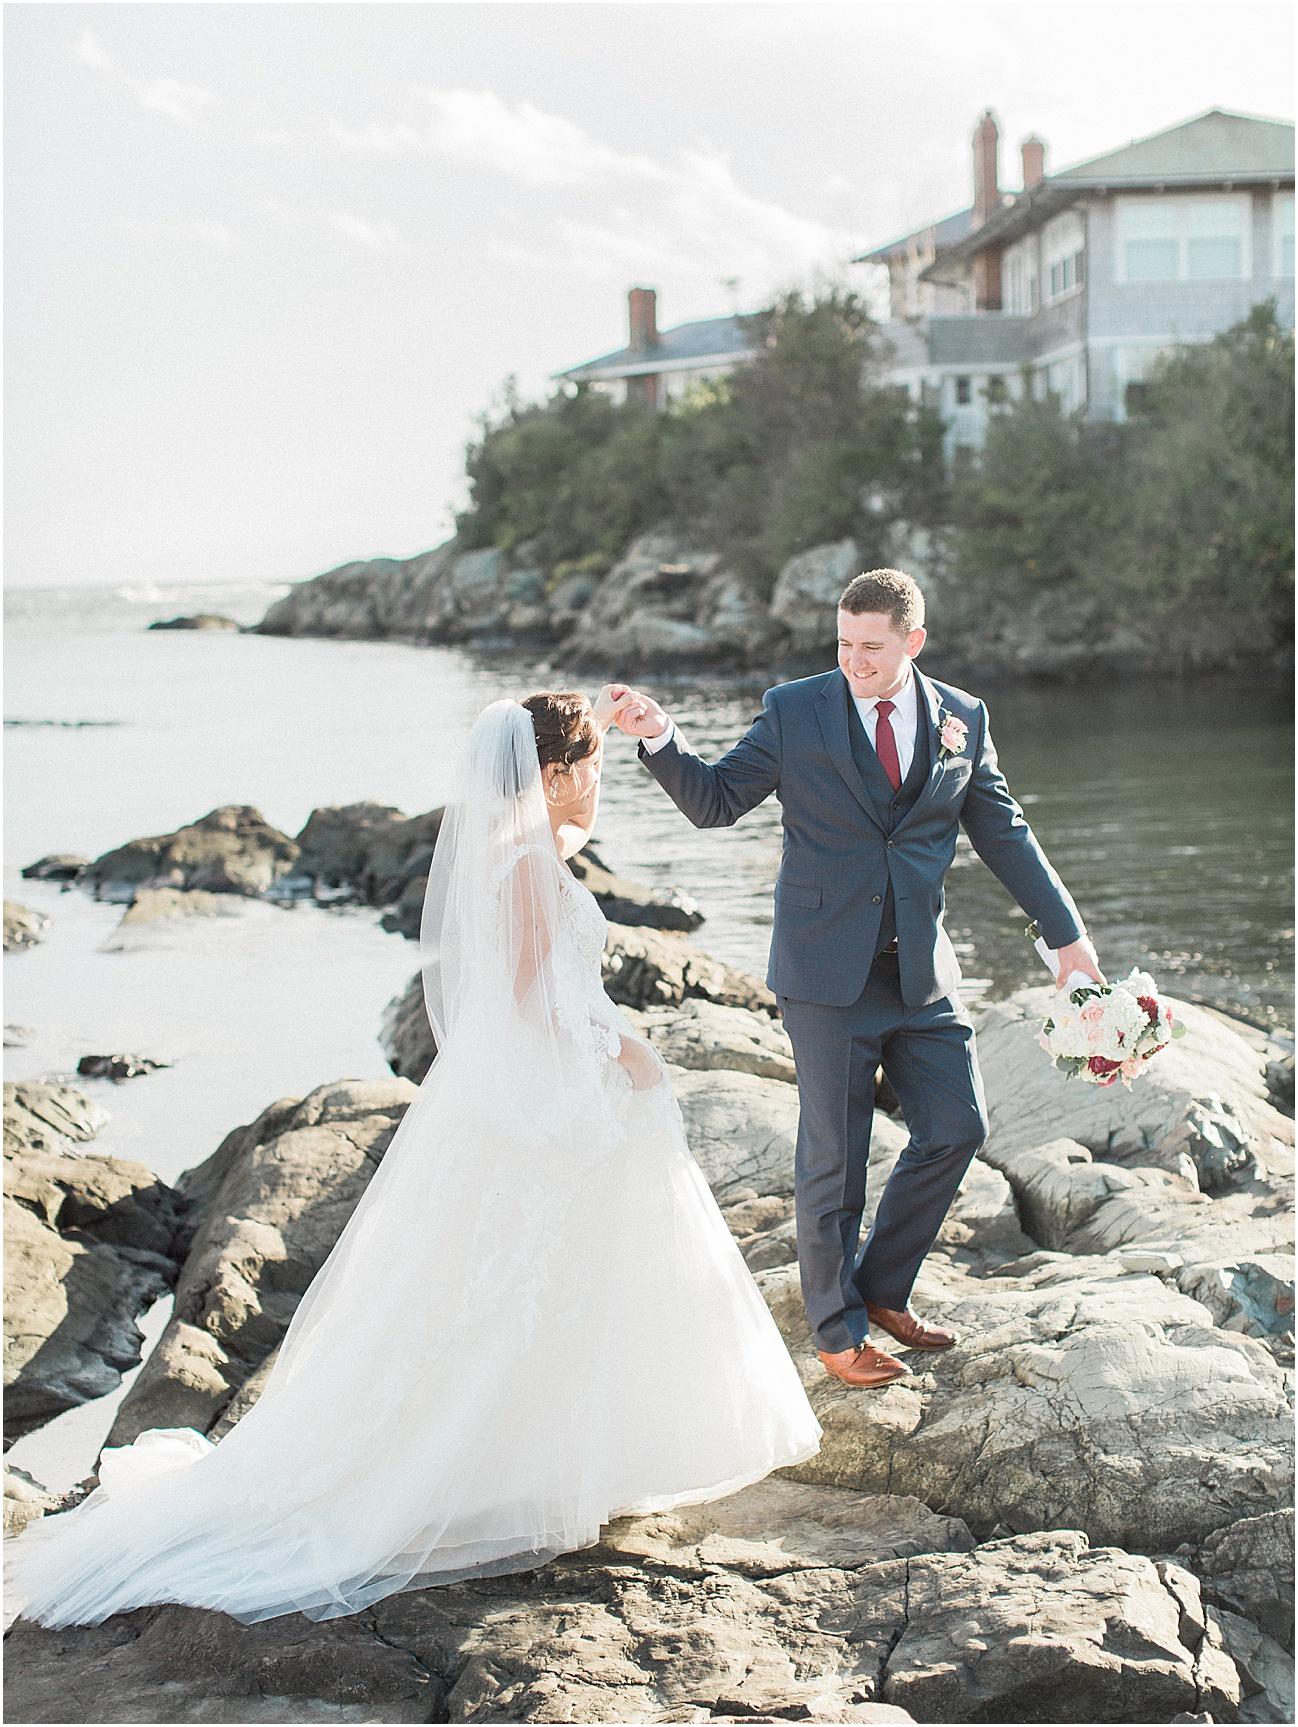 shannon_daniel_dan_atlantic_resort_saint_marys_st_mary_church_fall_newport_catholic_irish_cape_cod_boston_wedding_photographer_meredith_jane_photography_photo_1630.jpg